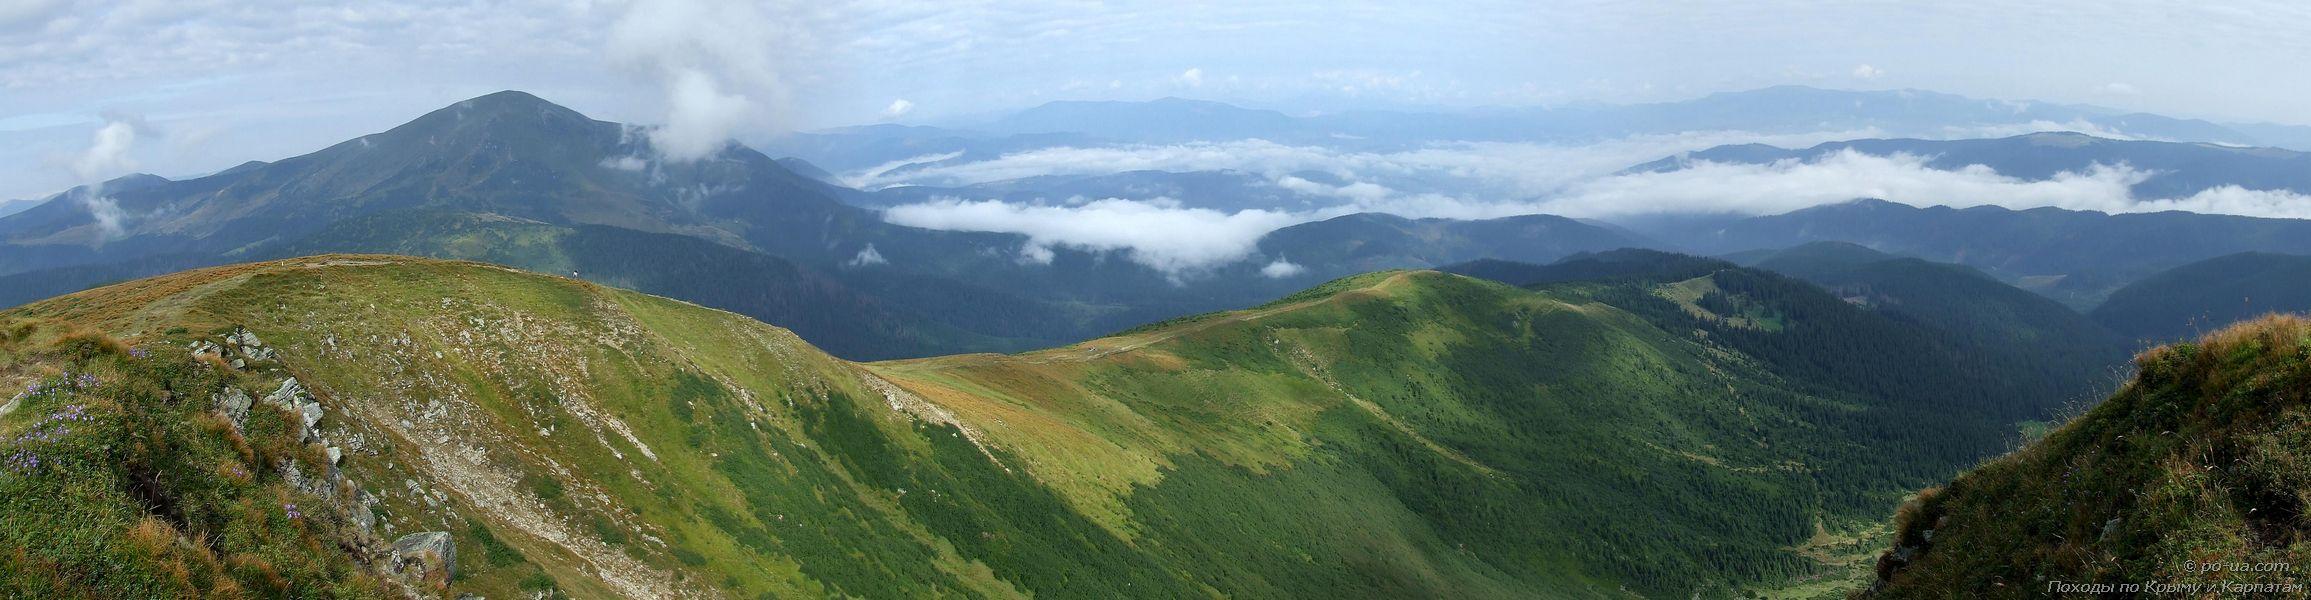 Панорама с Черногорского хребта